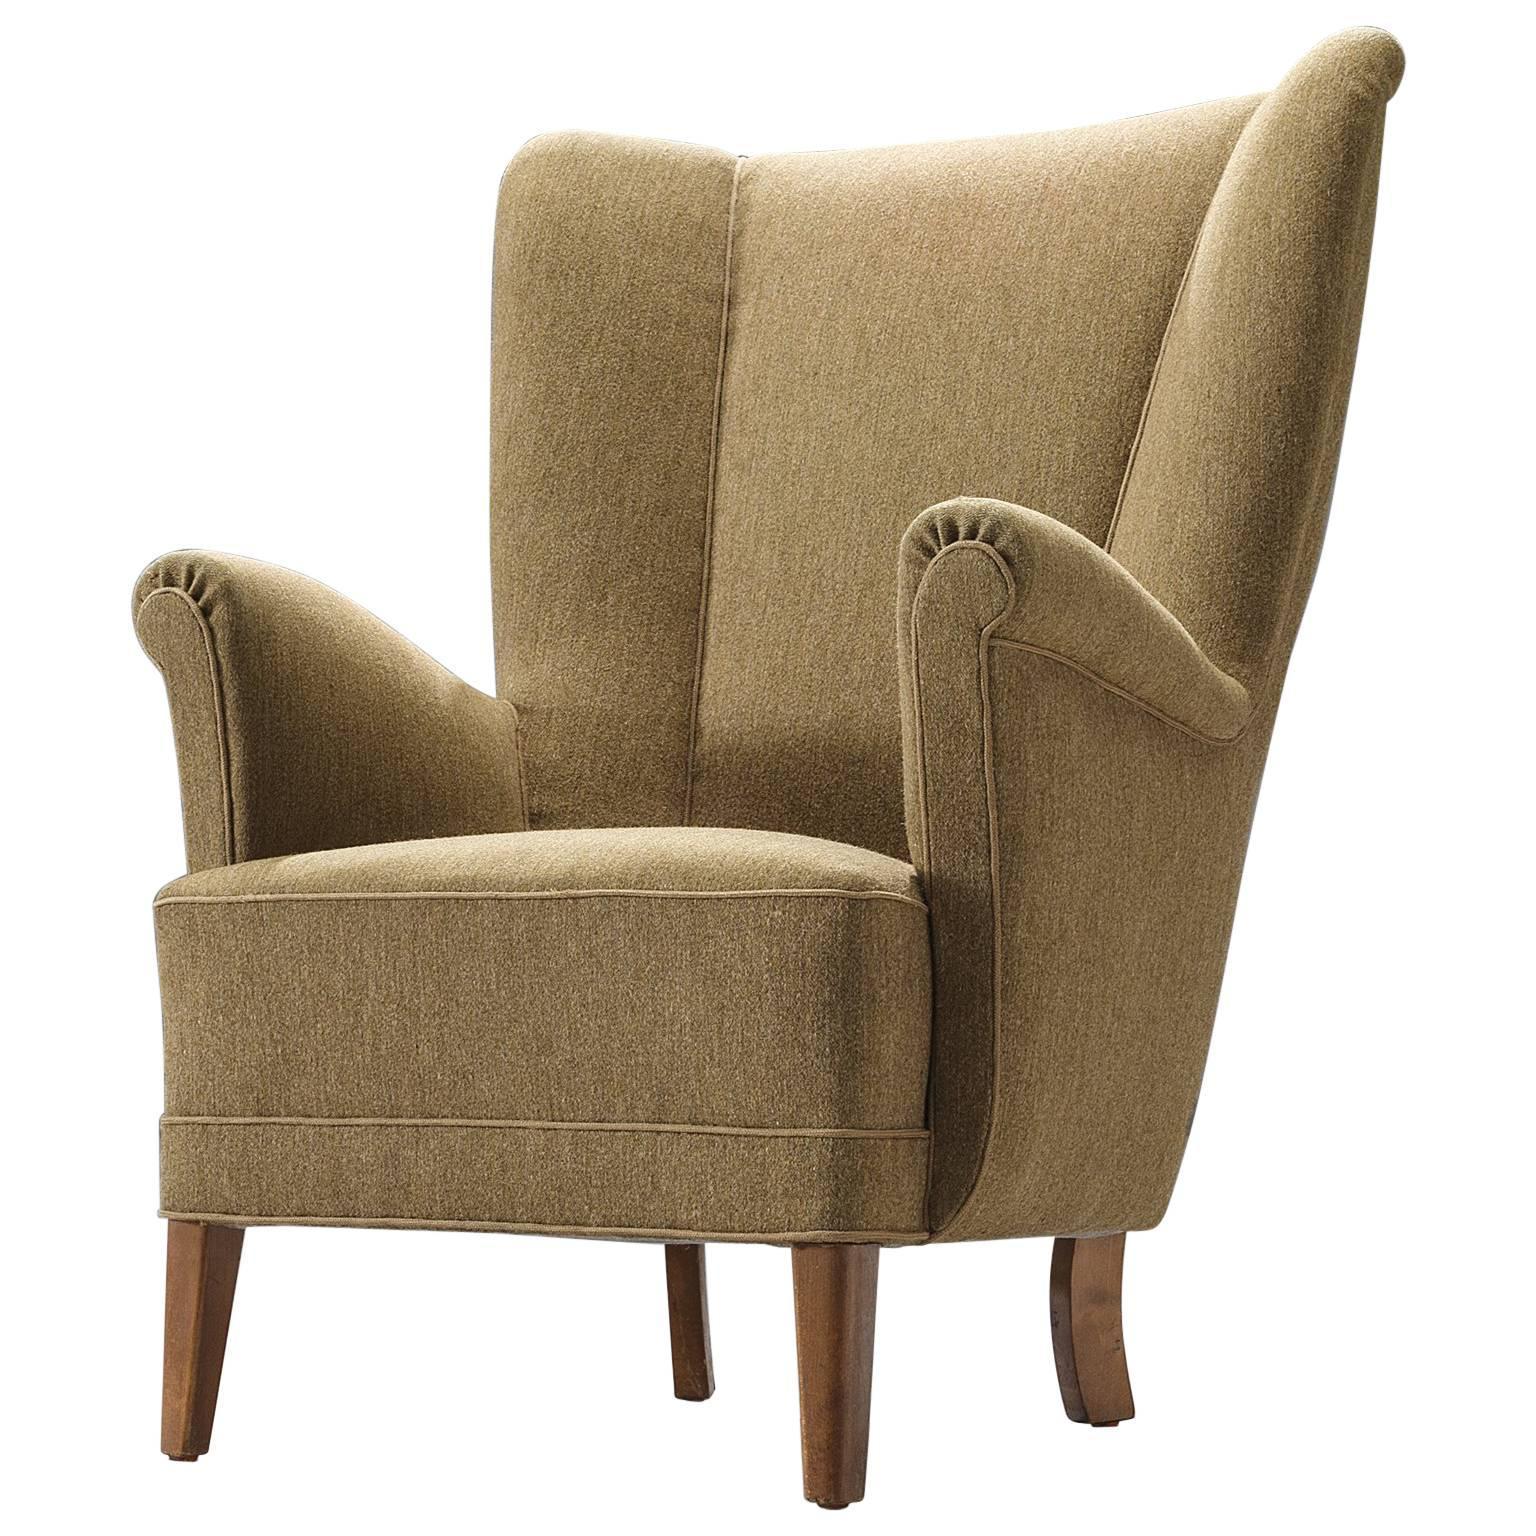 Wingback Chair in Original Woollen Upholstery